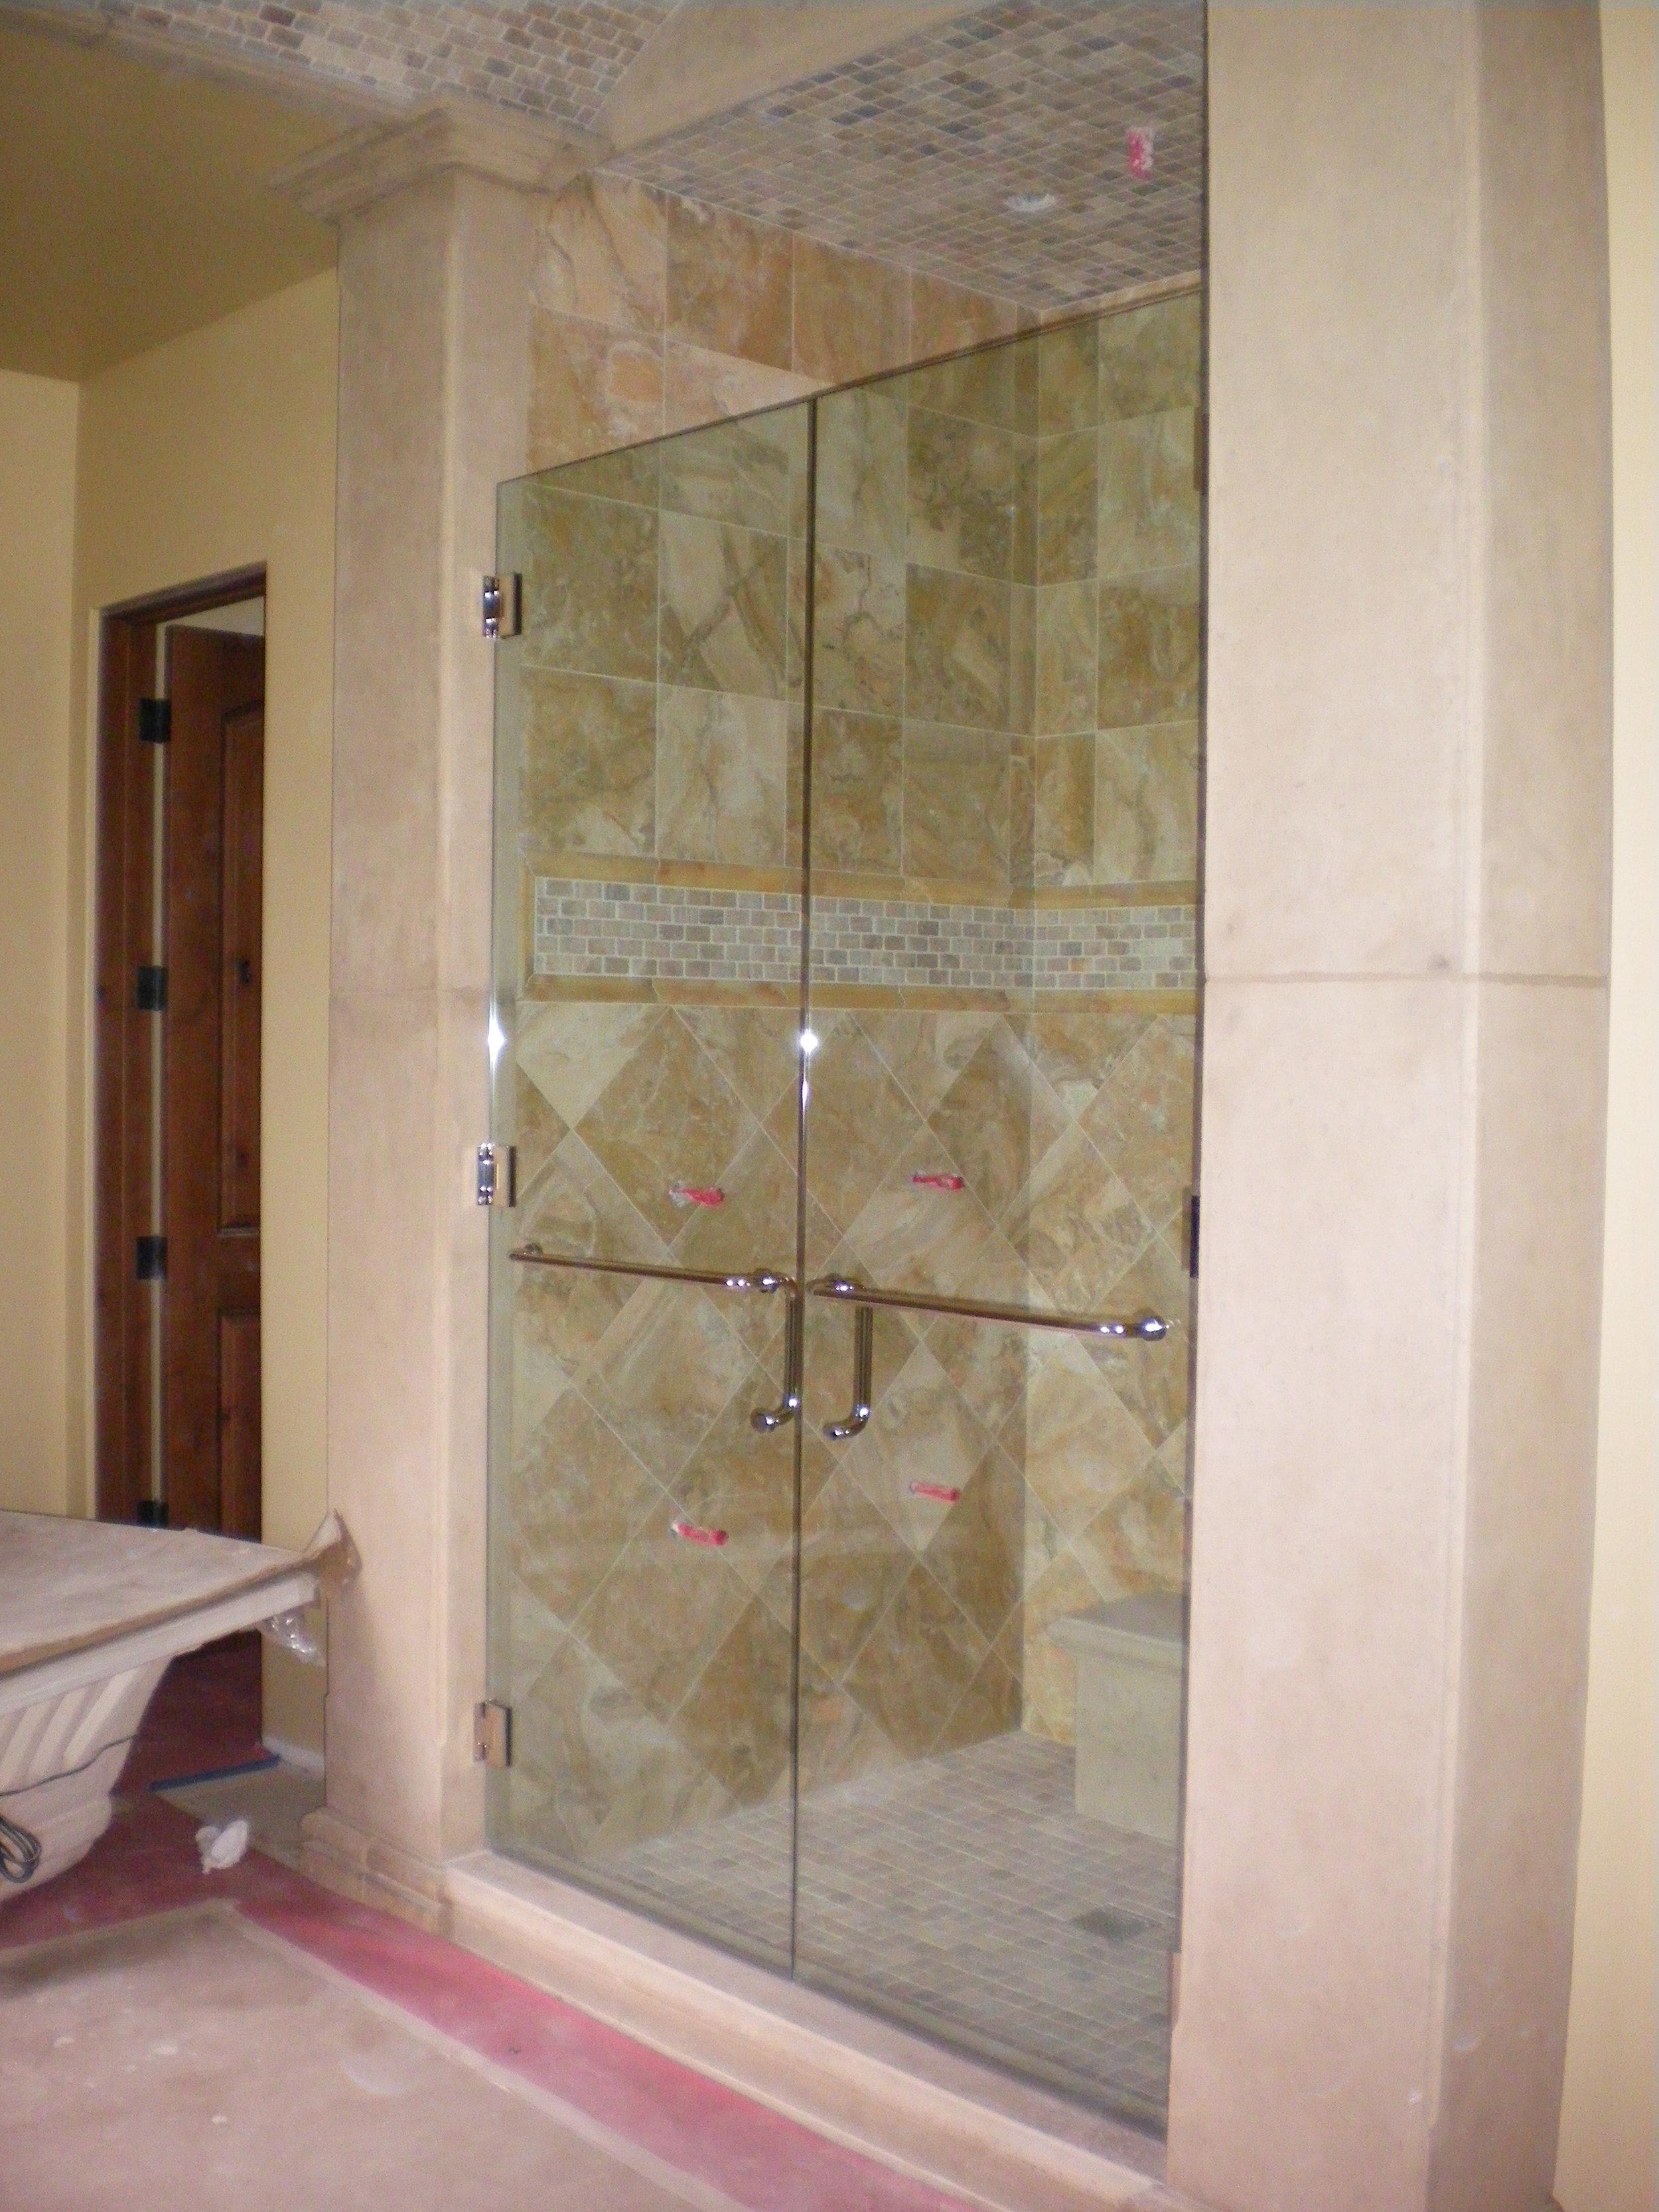 Shower-Doors-Residential-Photos-35.jpg